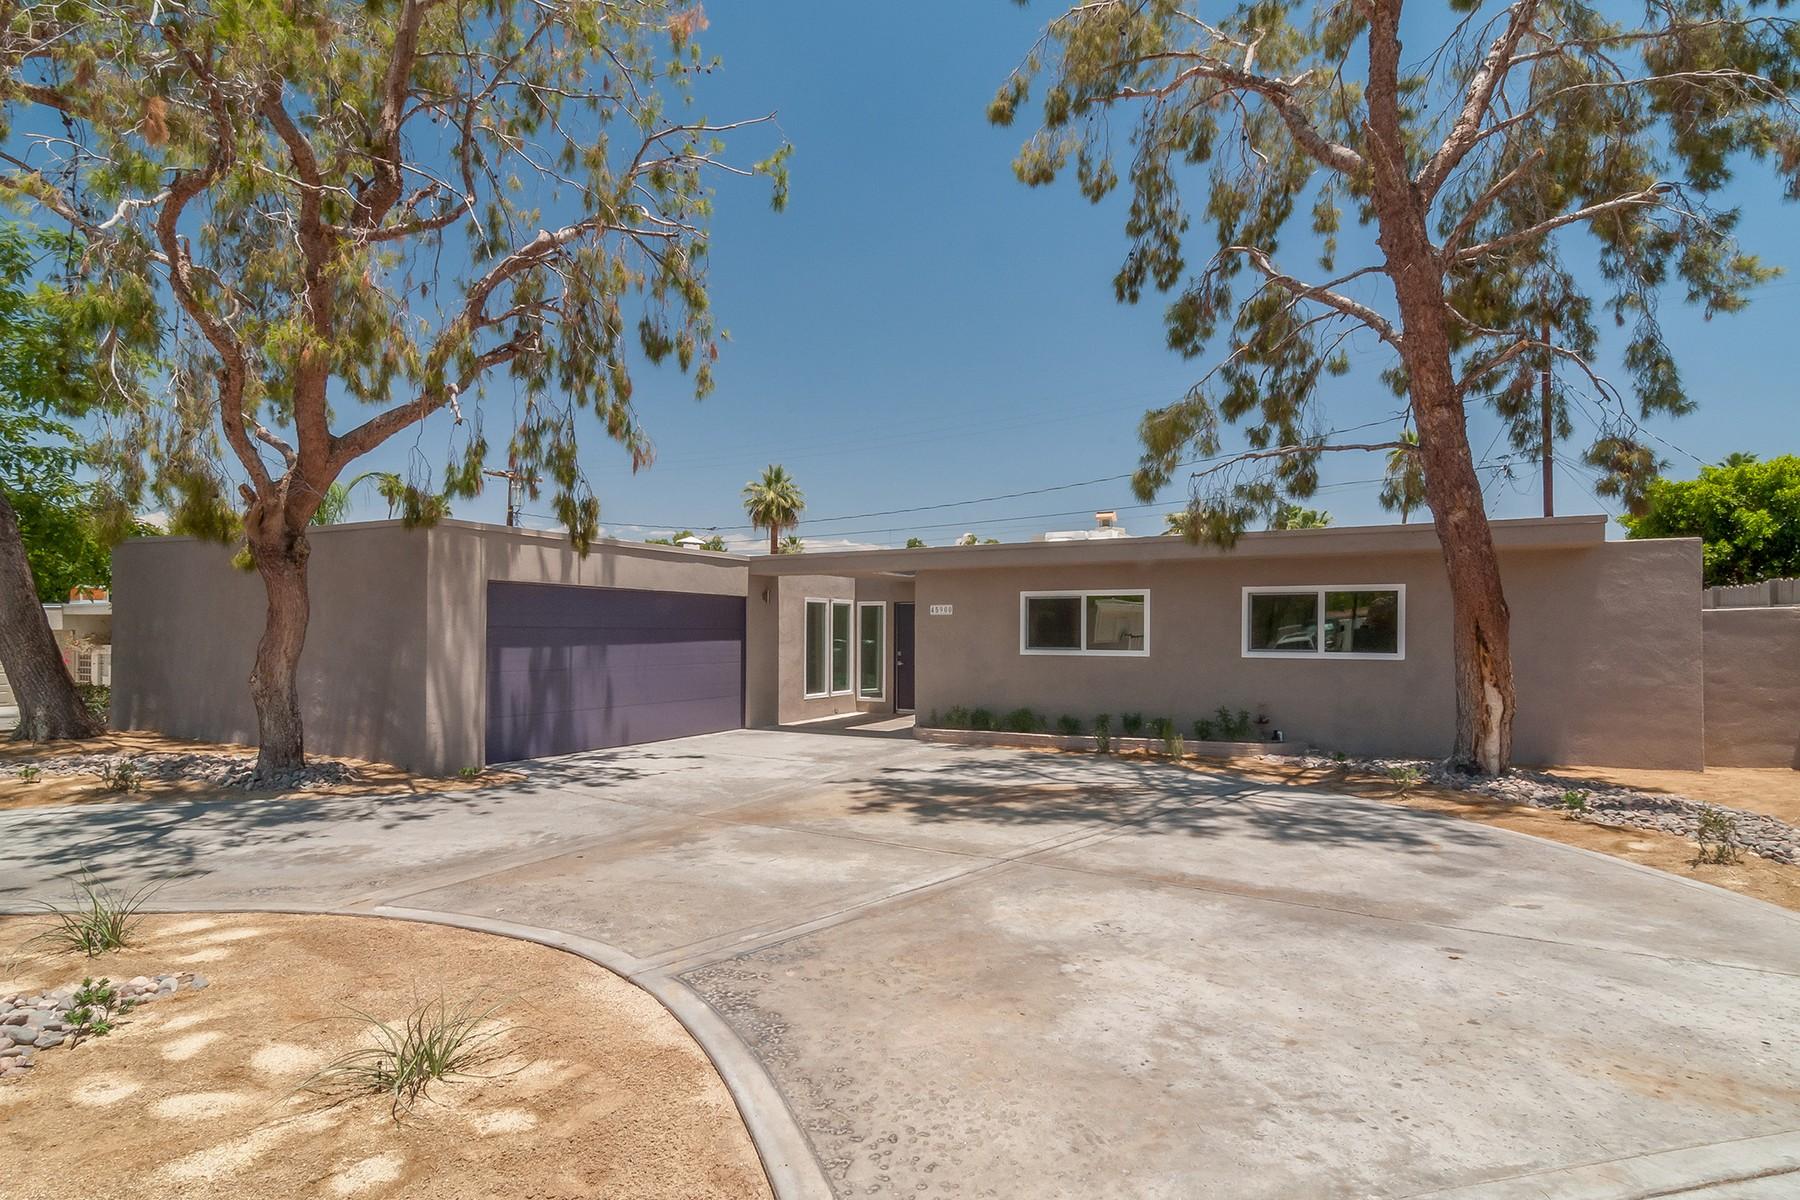 Single Family Home for Sale at 45900 Quailbrush St Palm Desert, California 92260 United States